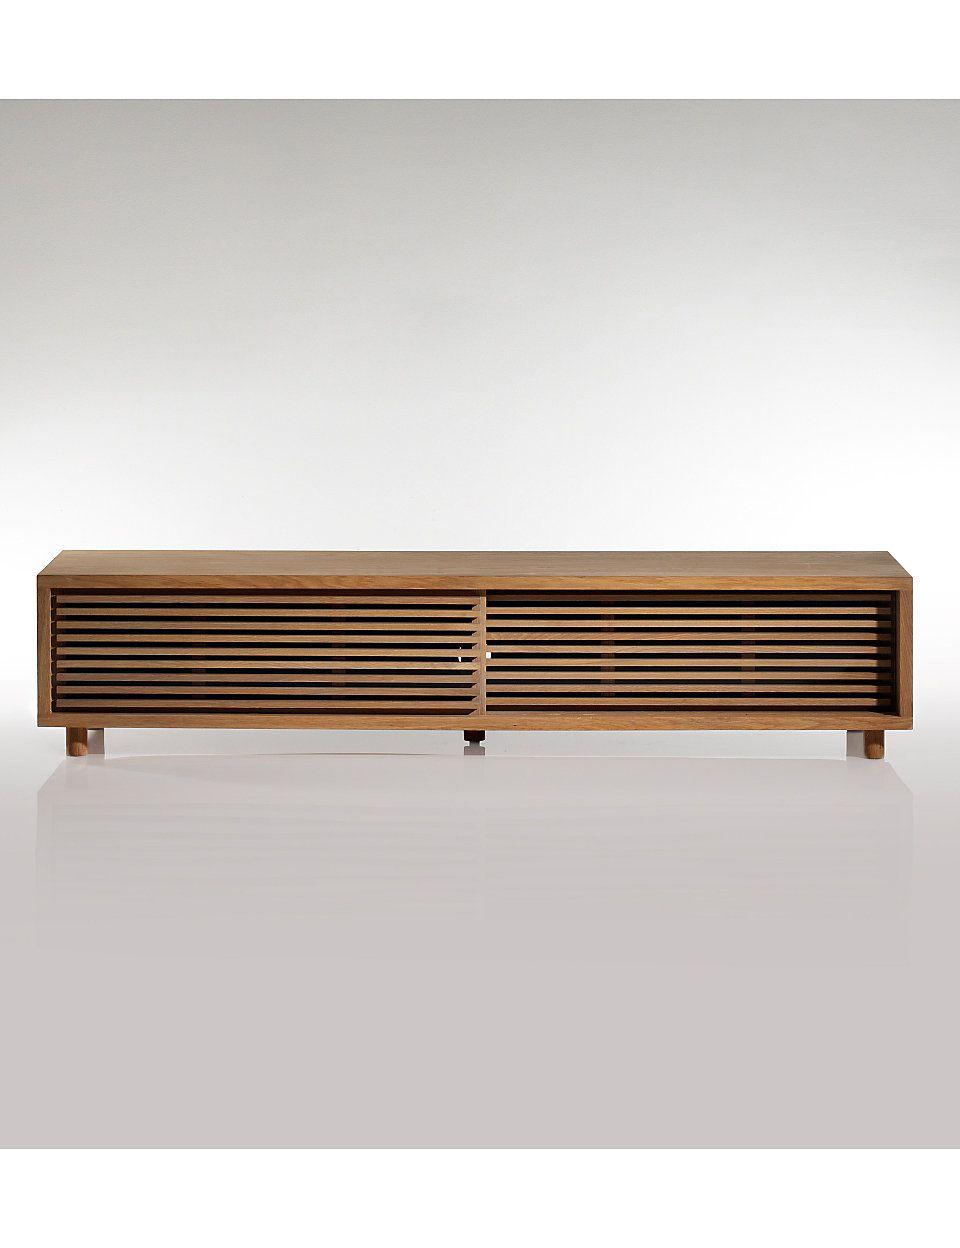 Conran Aiken Slatted Tv Cabinet Tv Cabinets Oak Tv with dimensions 960 X 1248